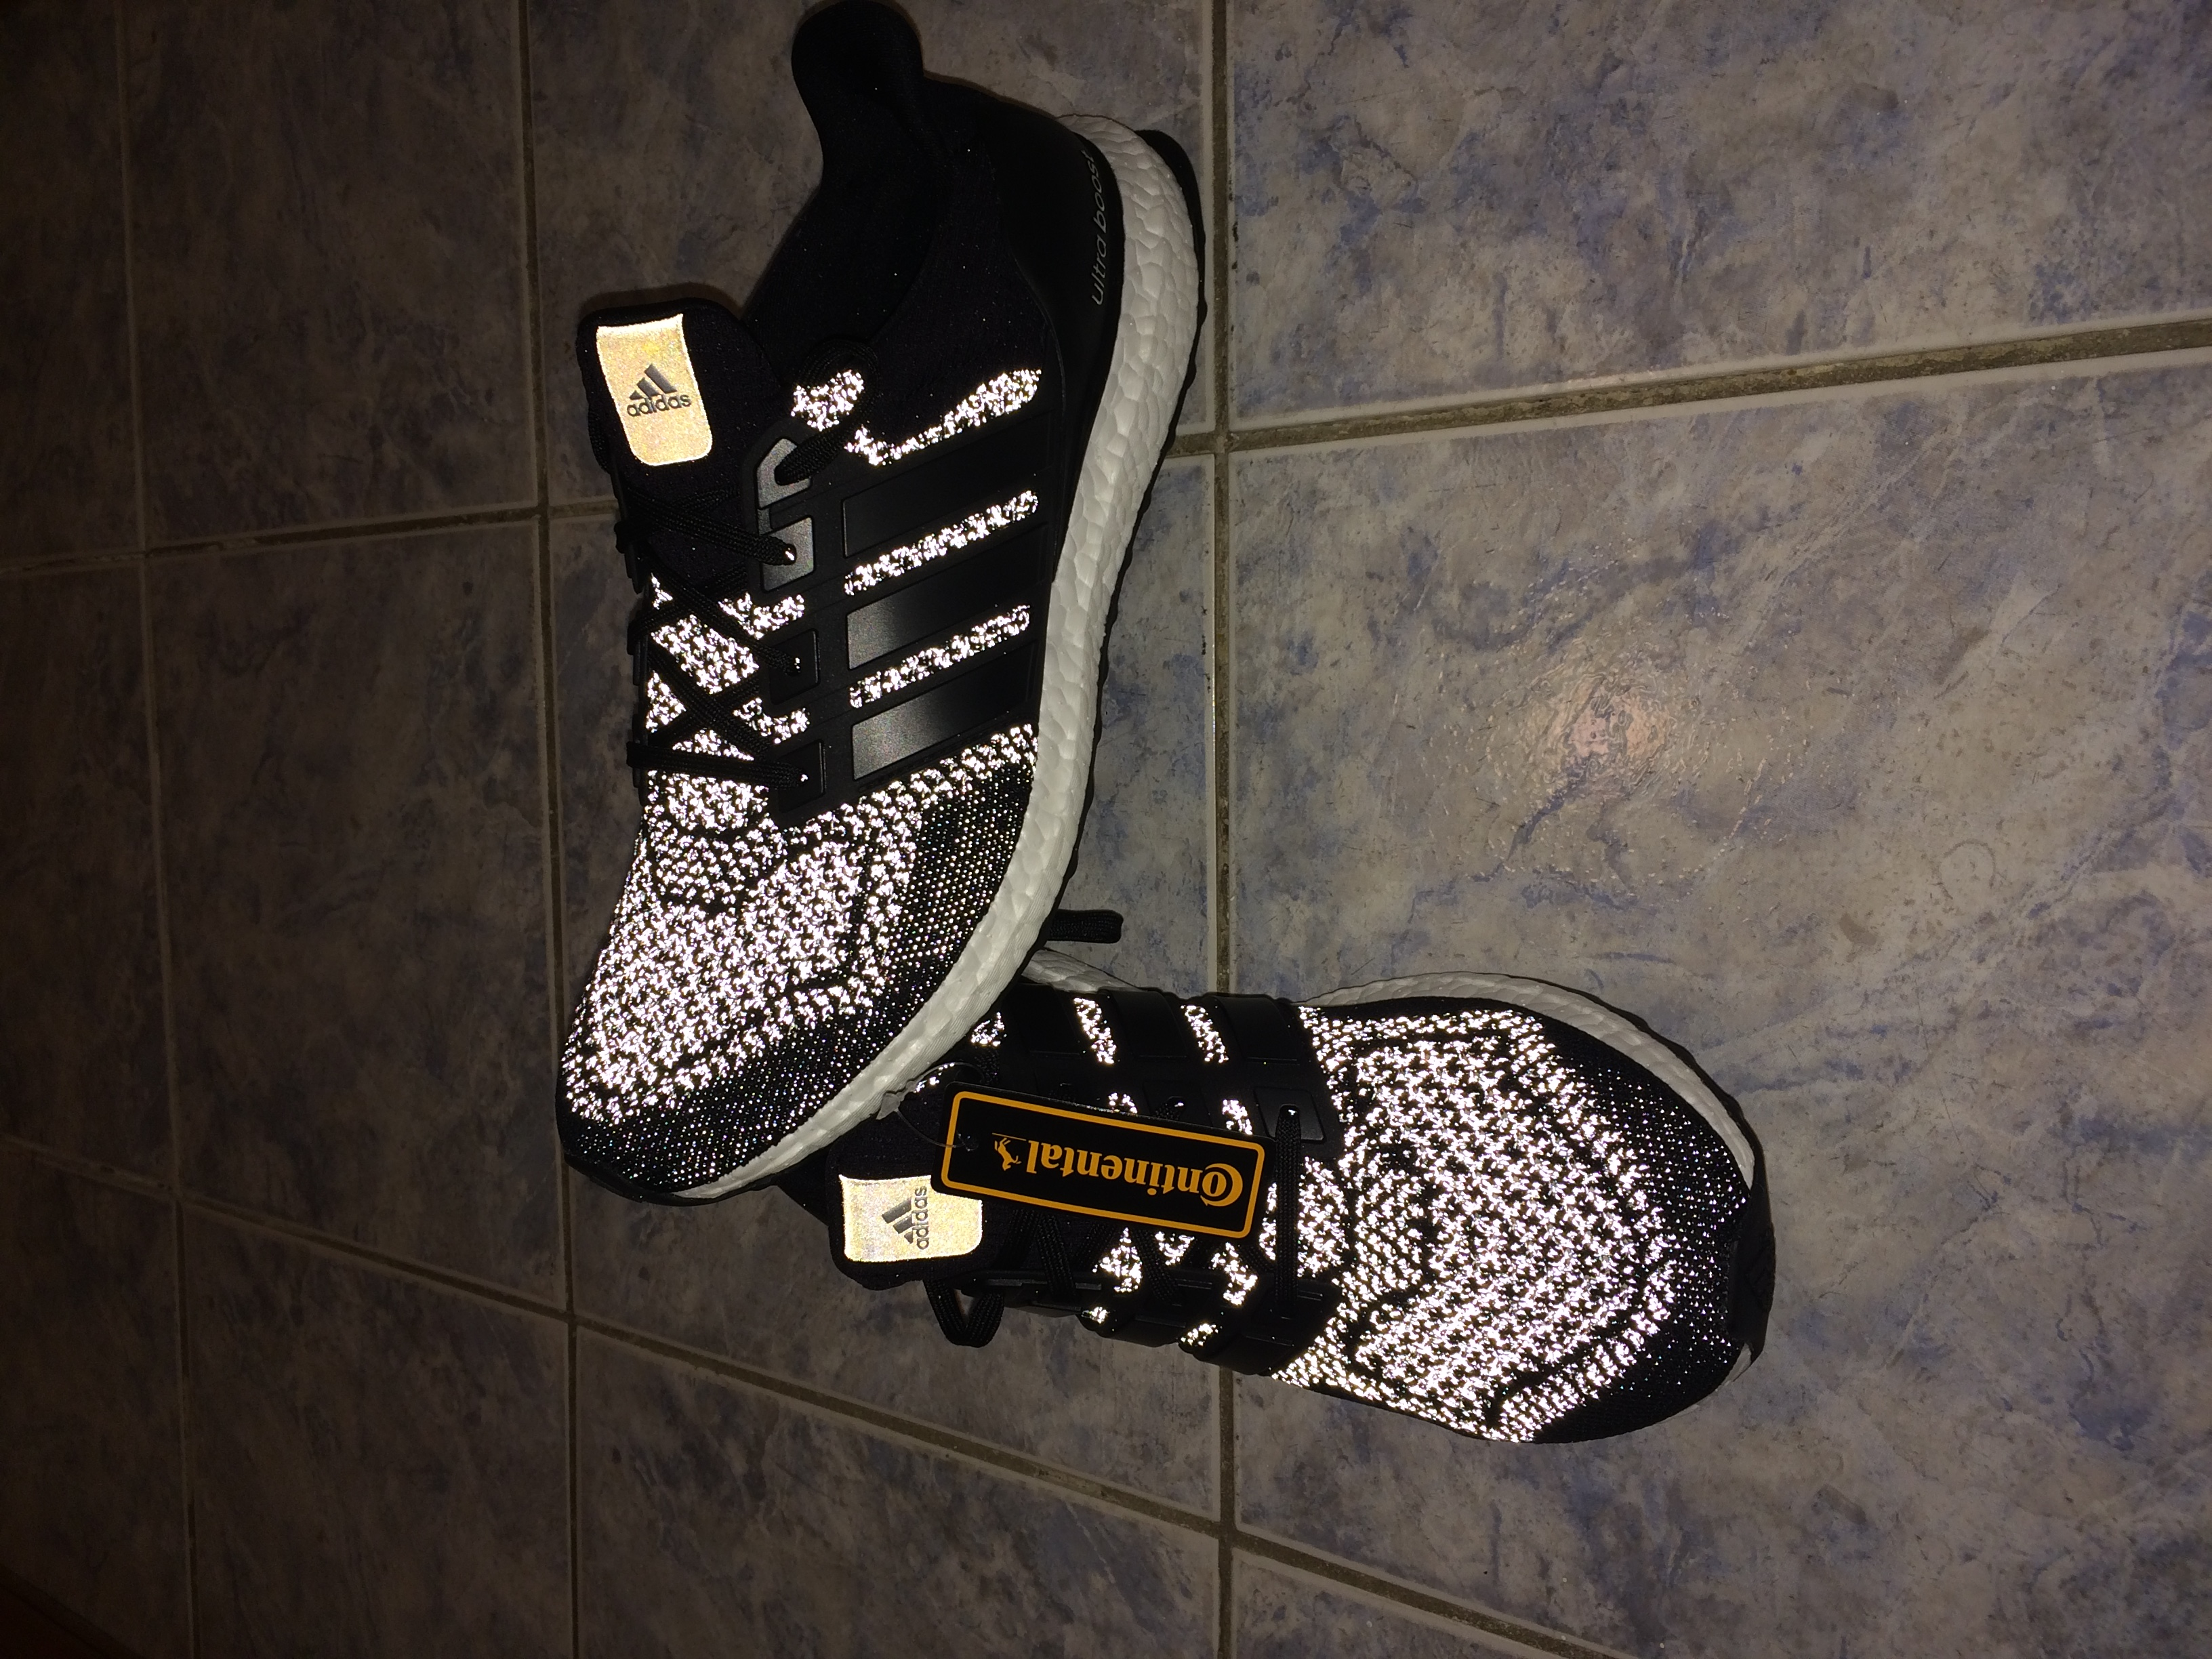 9cc9eaa0d7408 Adidas Ultra Boost Continental 3m